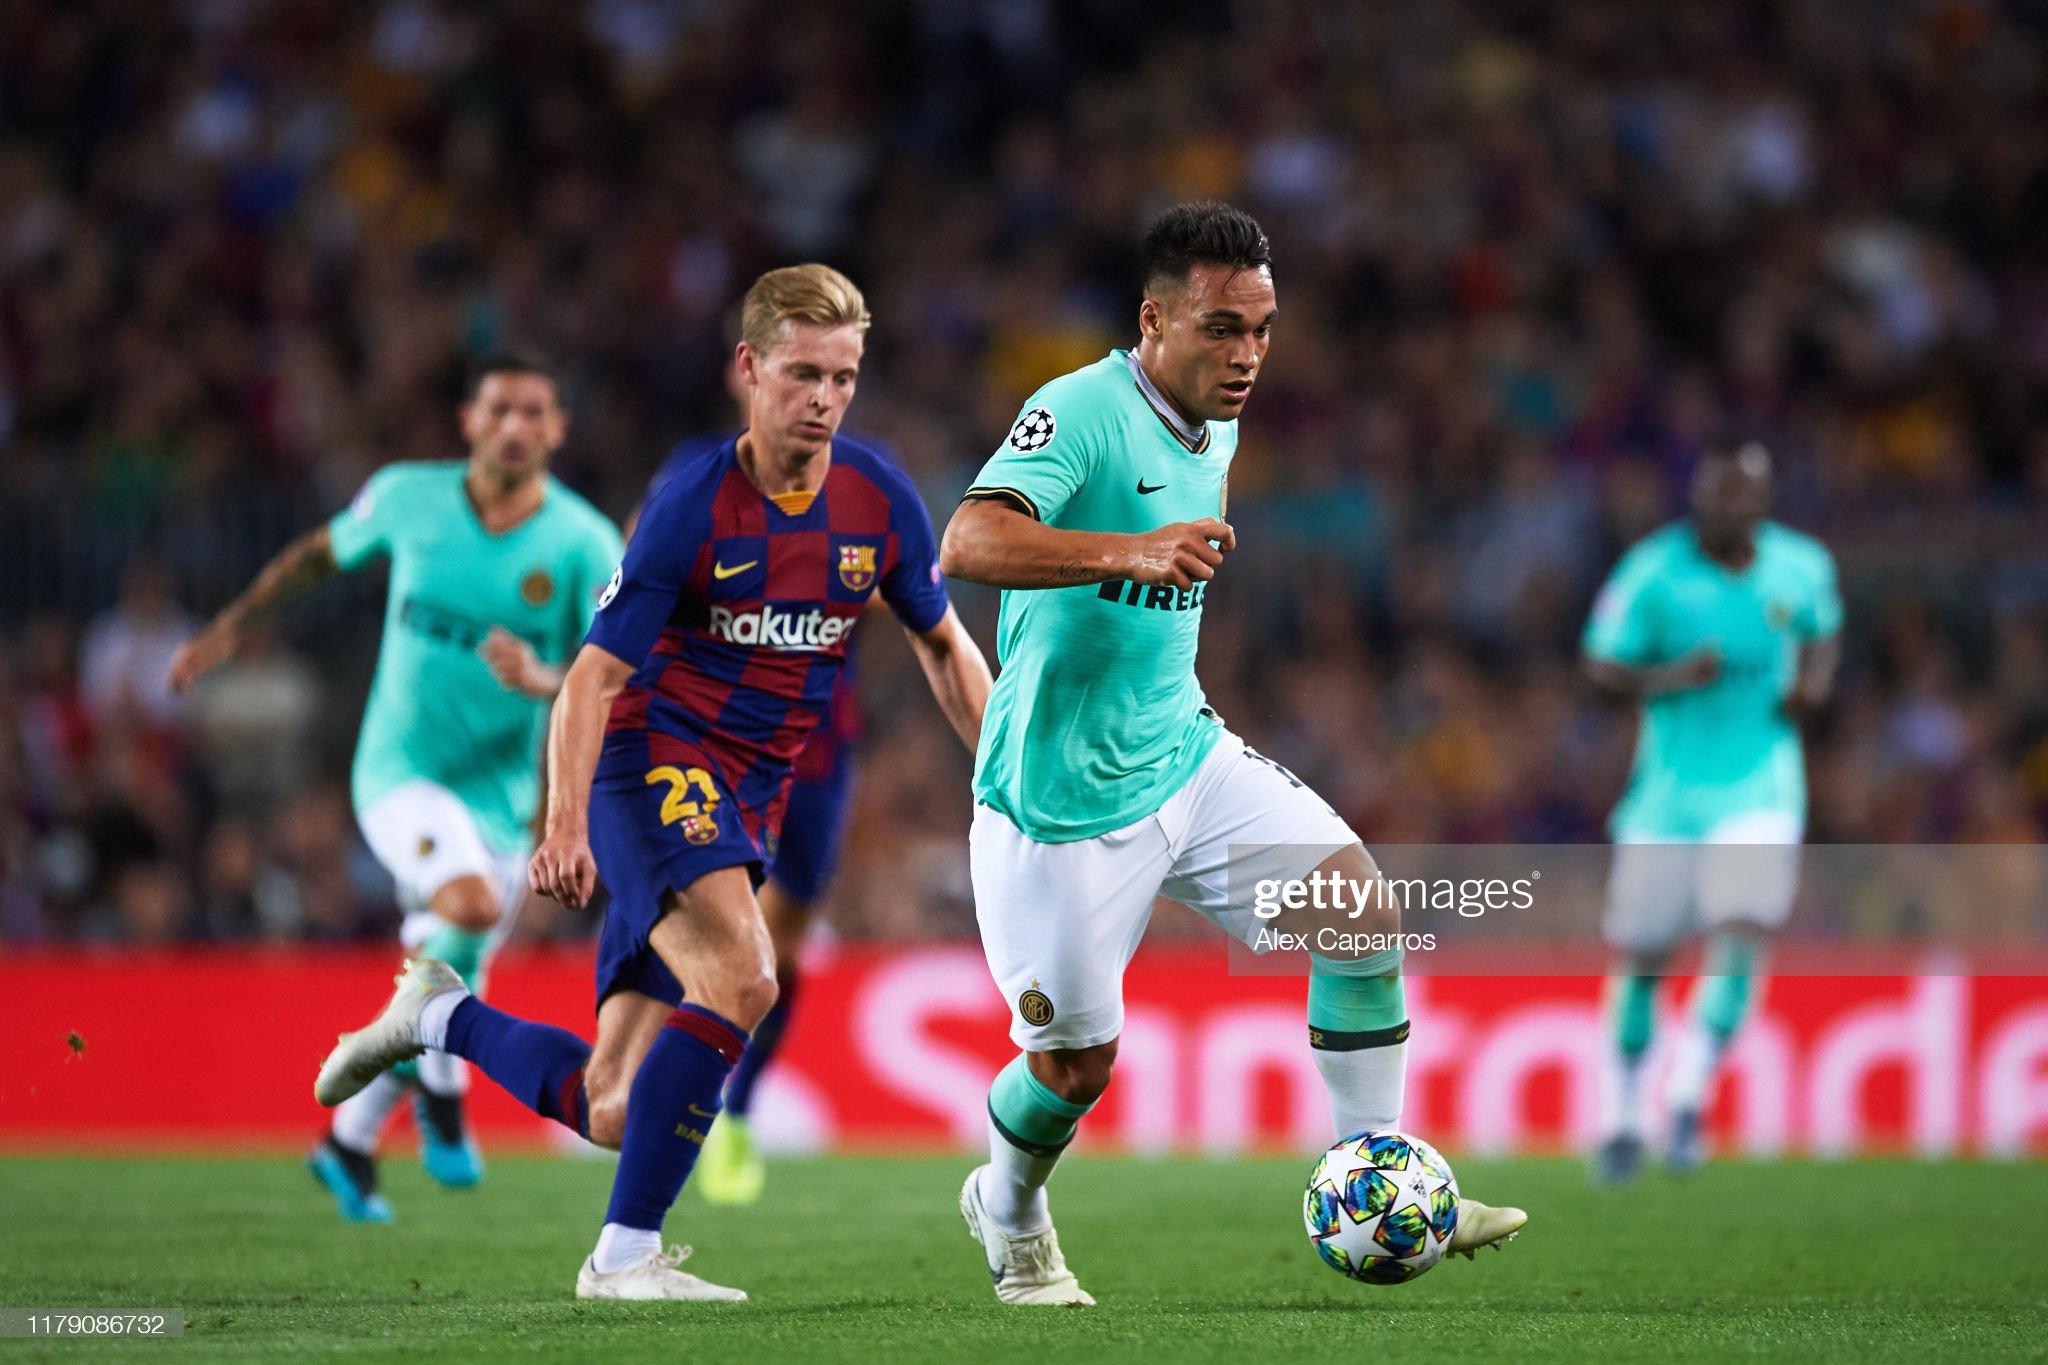 صور مباراة : برشلونة - إنتر 2-1 ( 02-10-2019 )  Lautaro-martinez-of-inter-runs-with-the-ball-followed-by-frenkie-de-picture-id1179086732?s=2048x2048